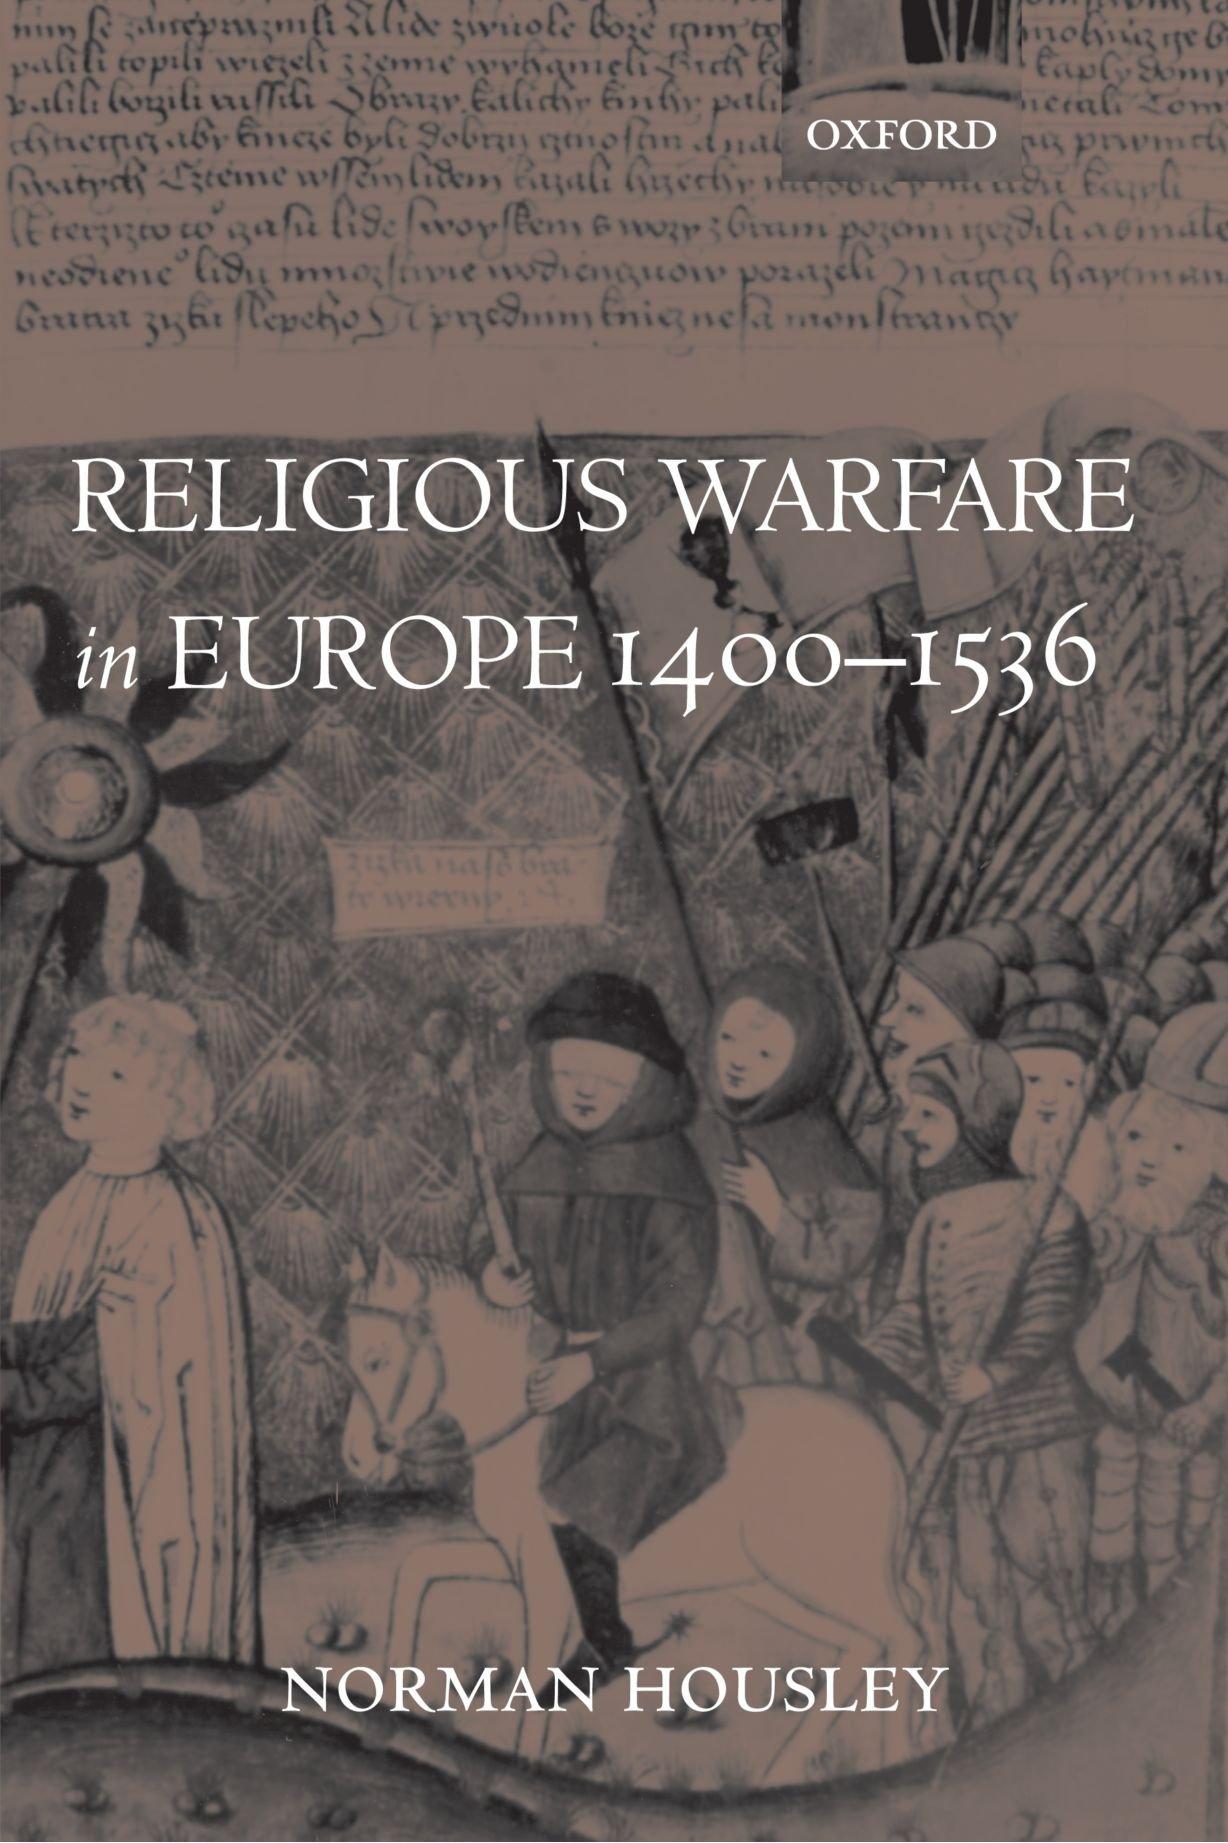 Religious Warfare in Europe 1400-1536 by Oxford University Press